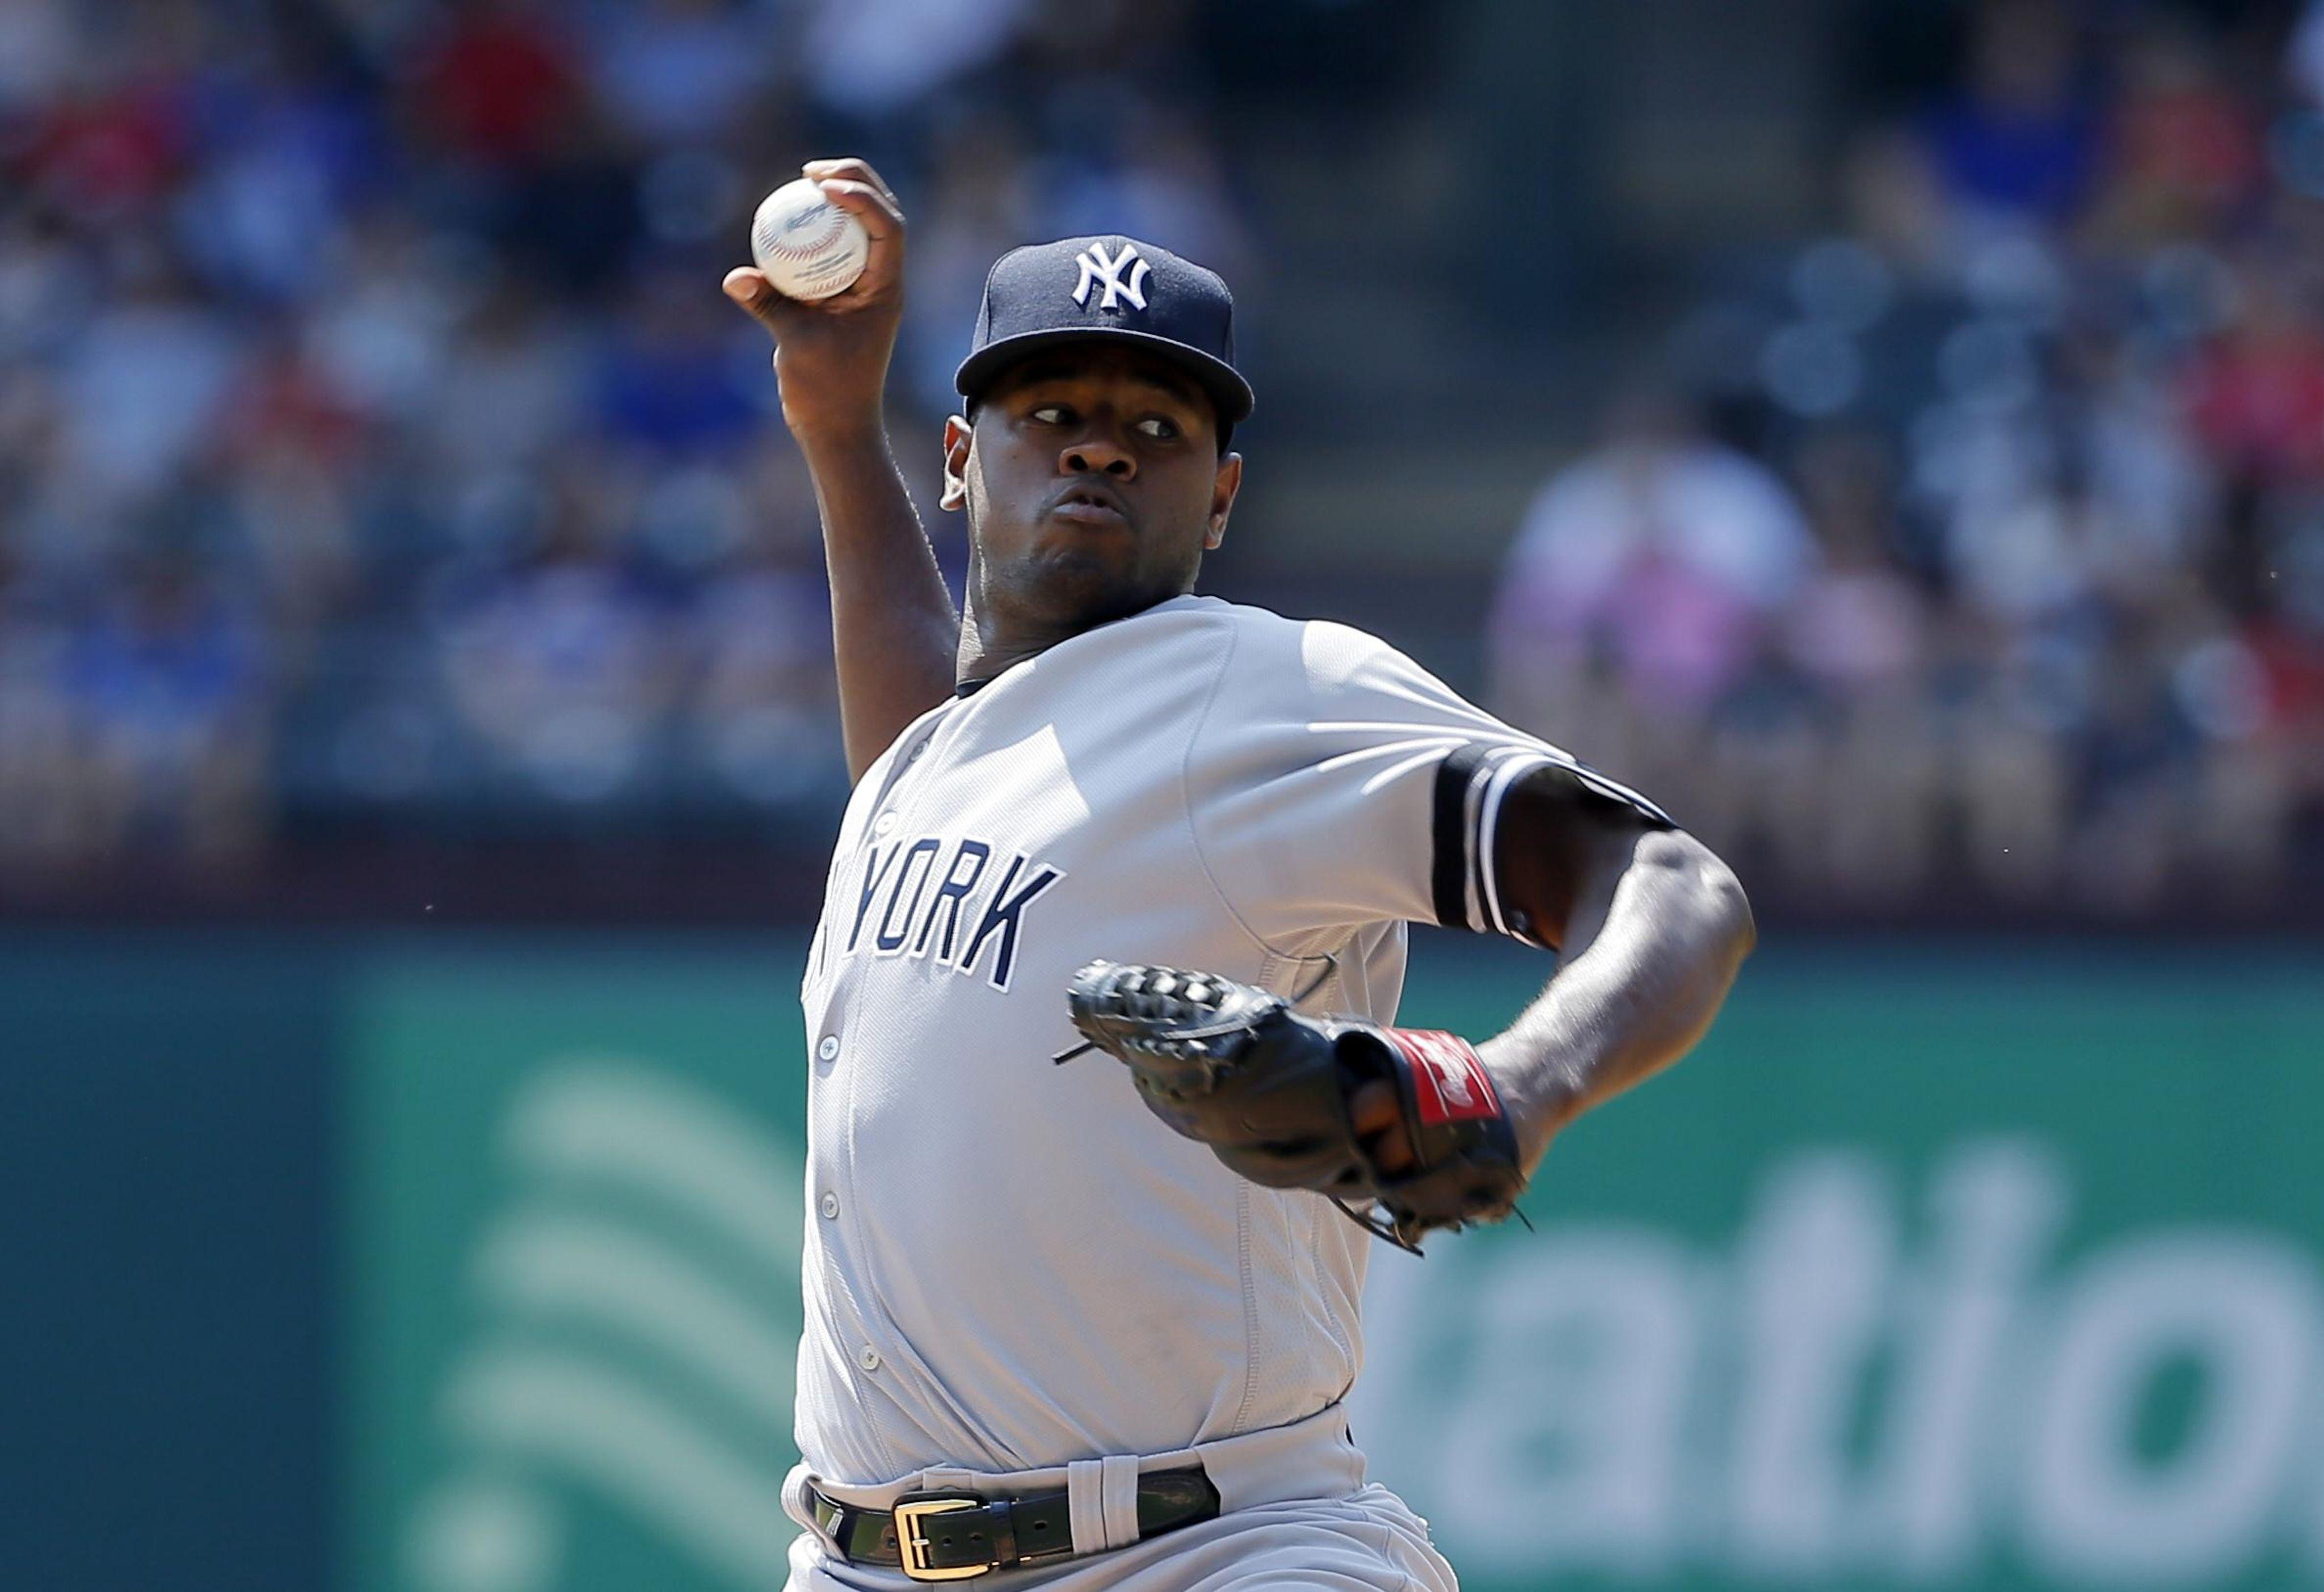 Yankees_rangers_baseball_46280_s4096x2805